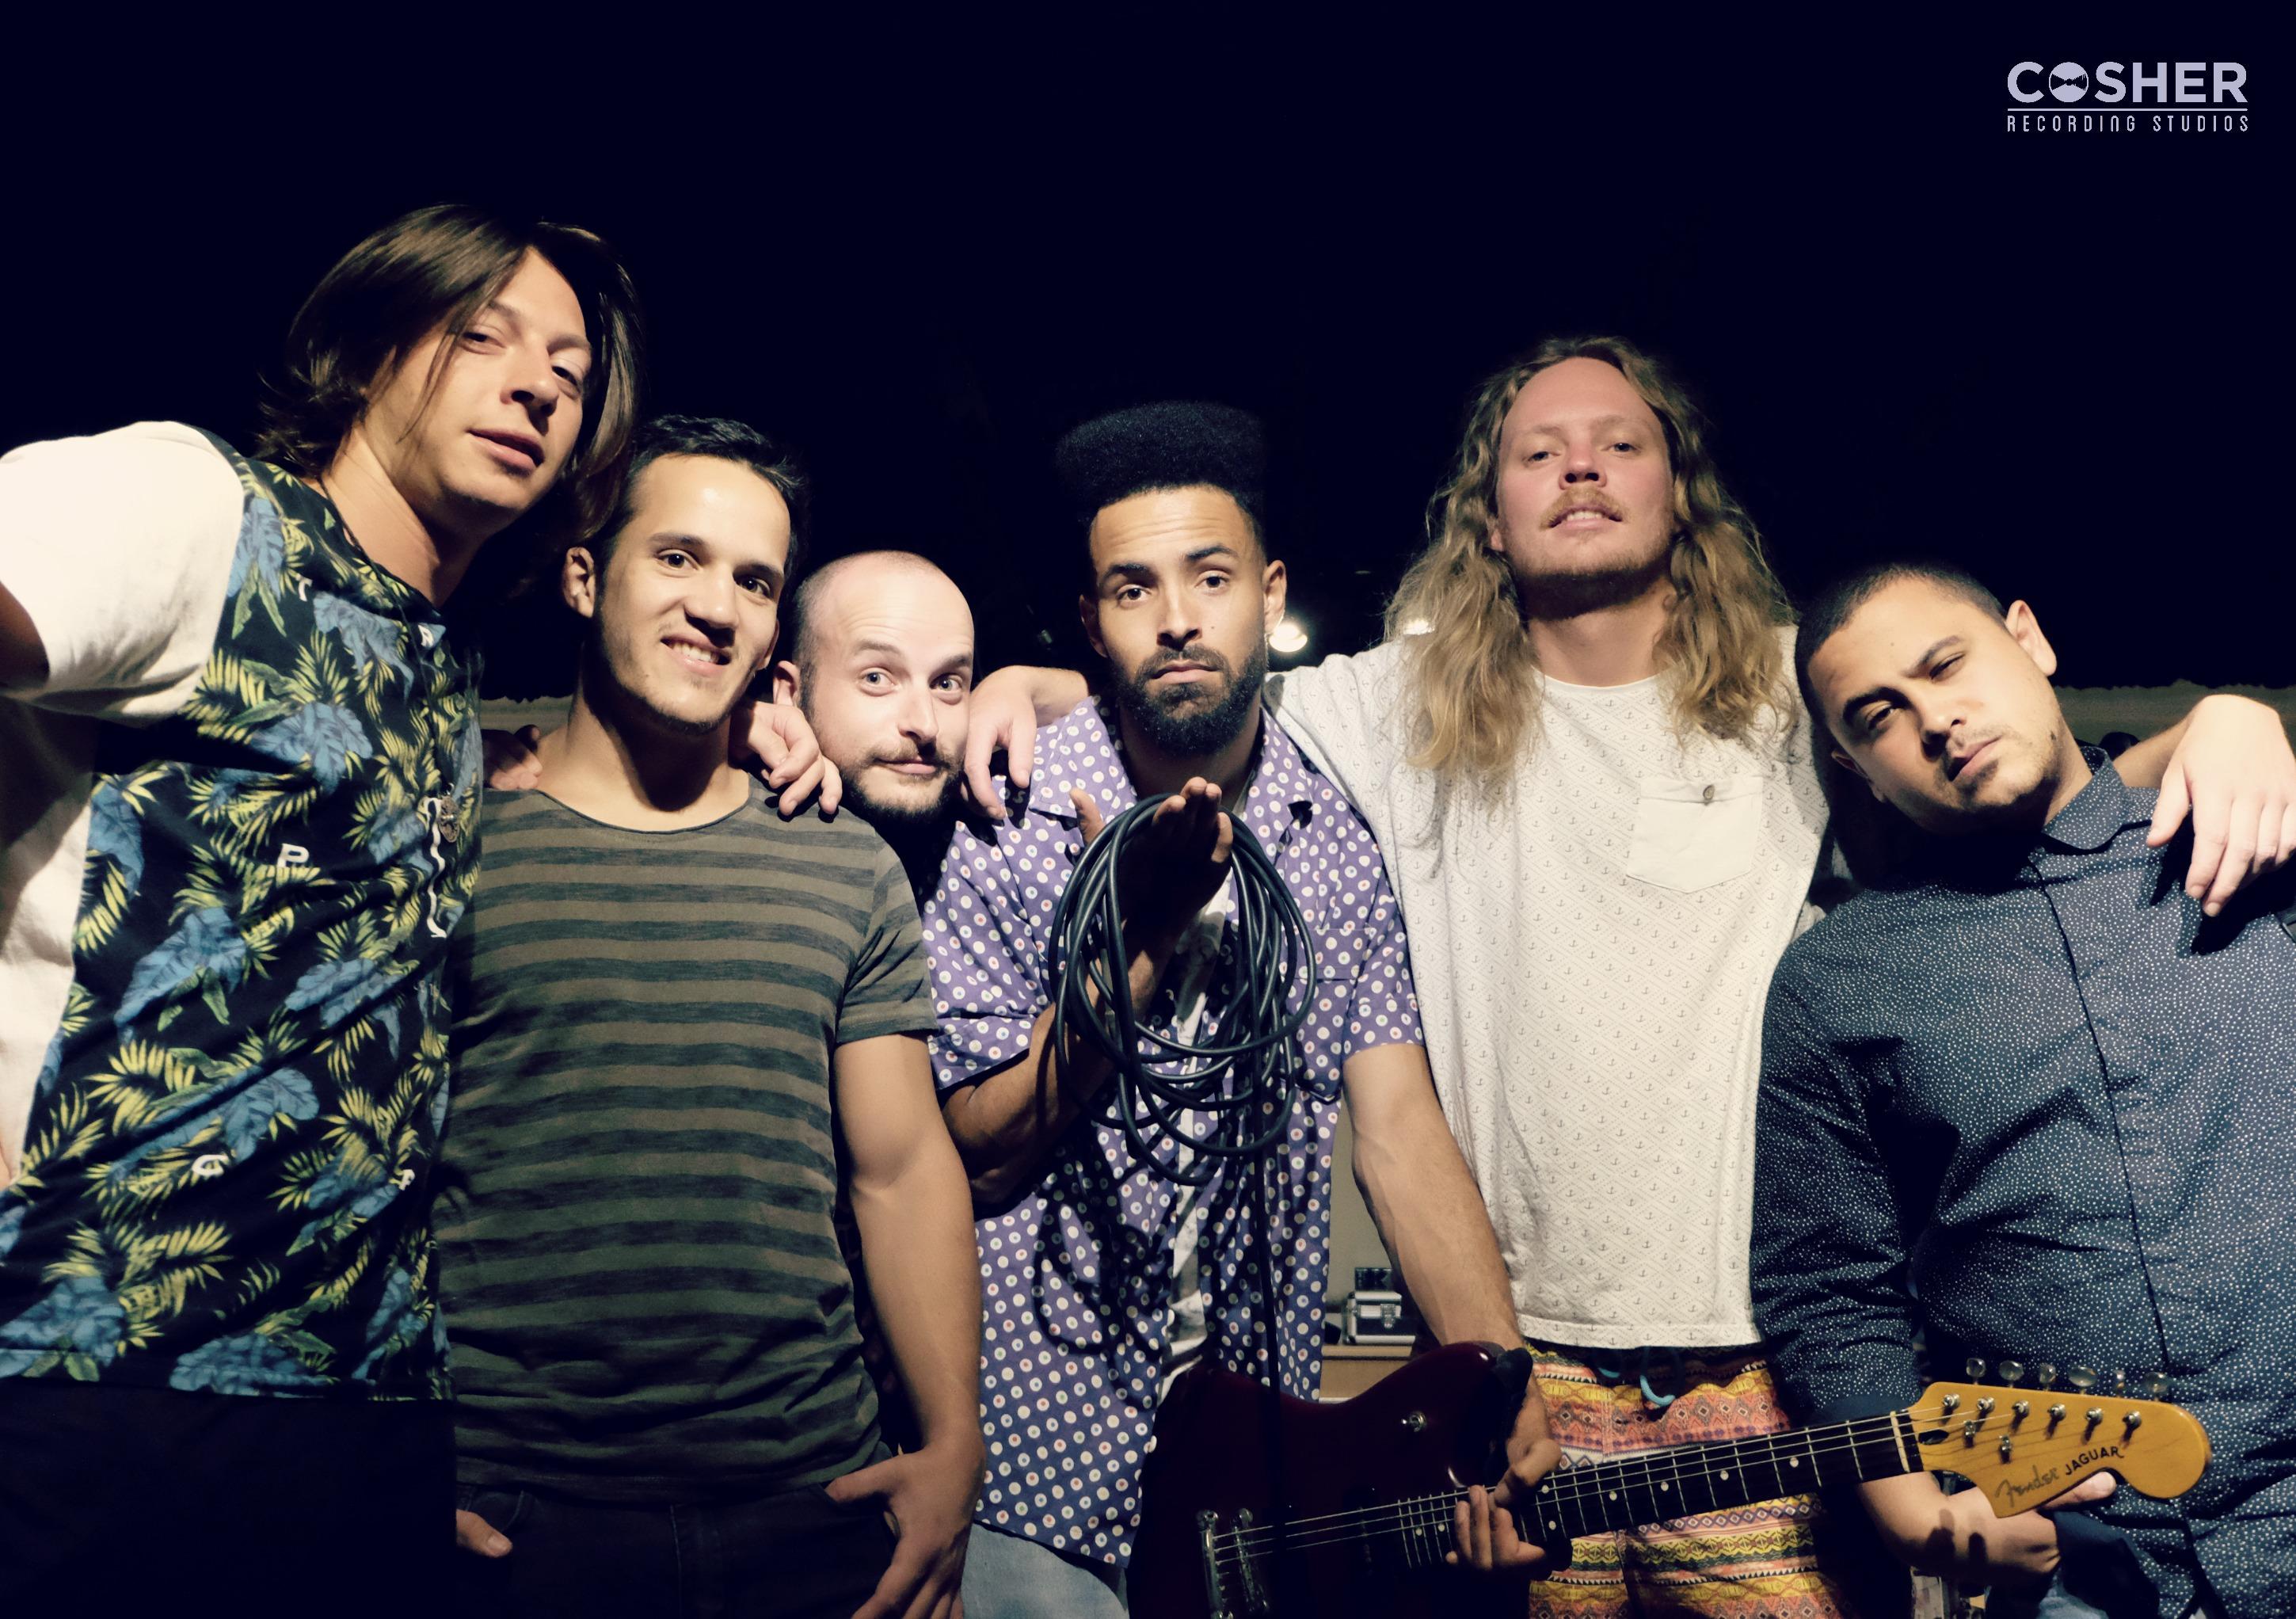 Grassy Spark Explain the Lyrics to 'Feel it' at Cosher Recording Studios